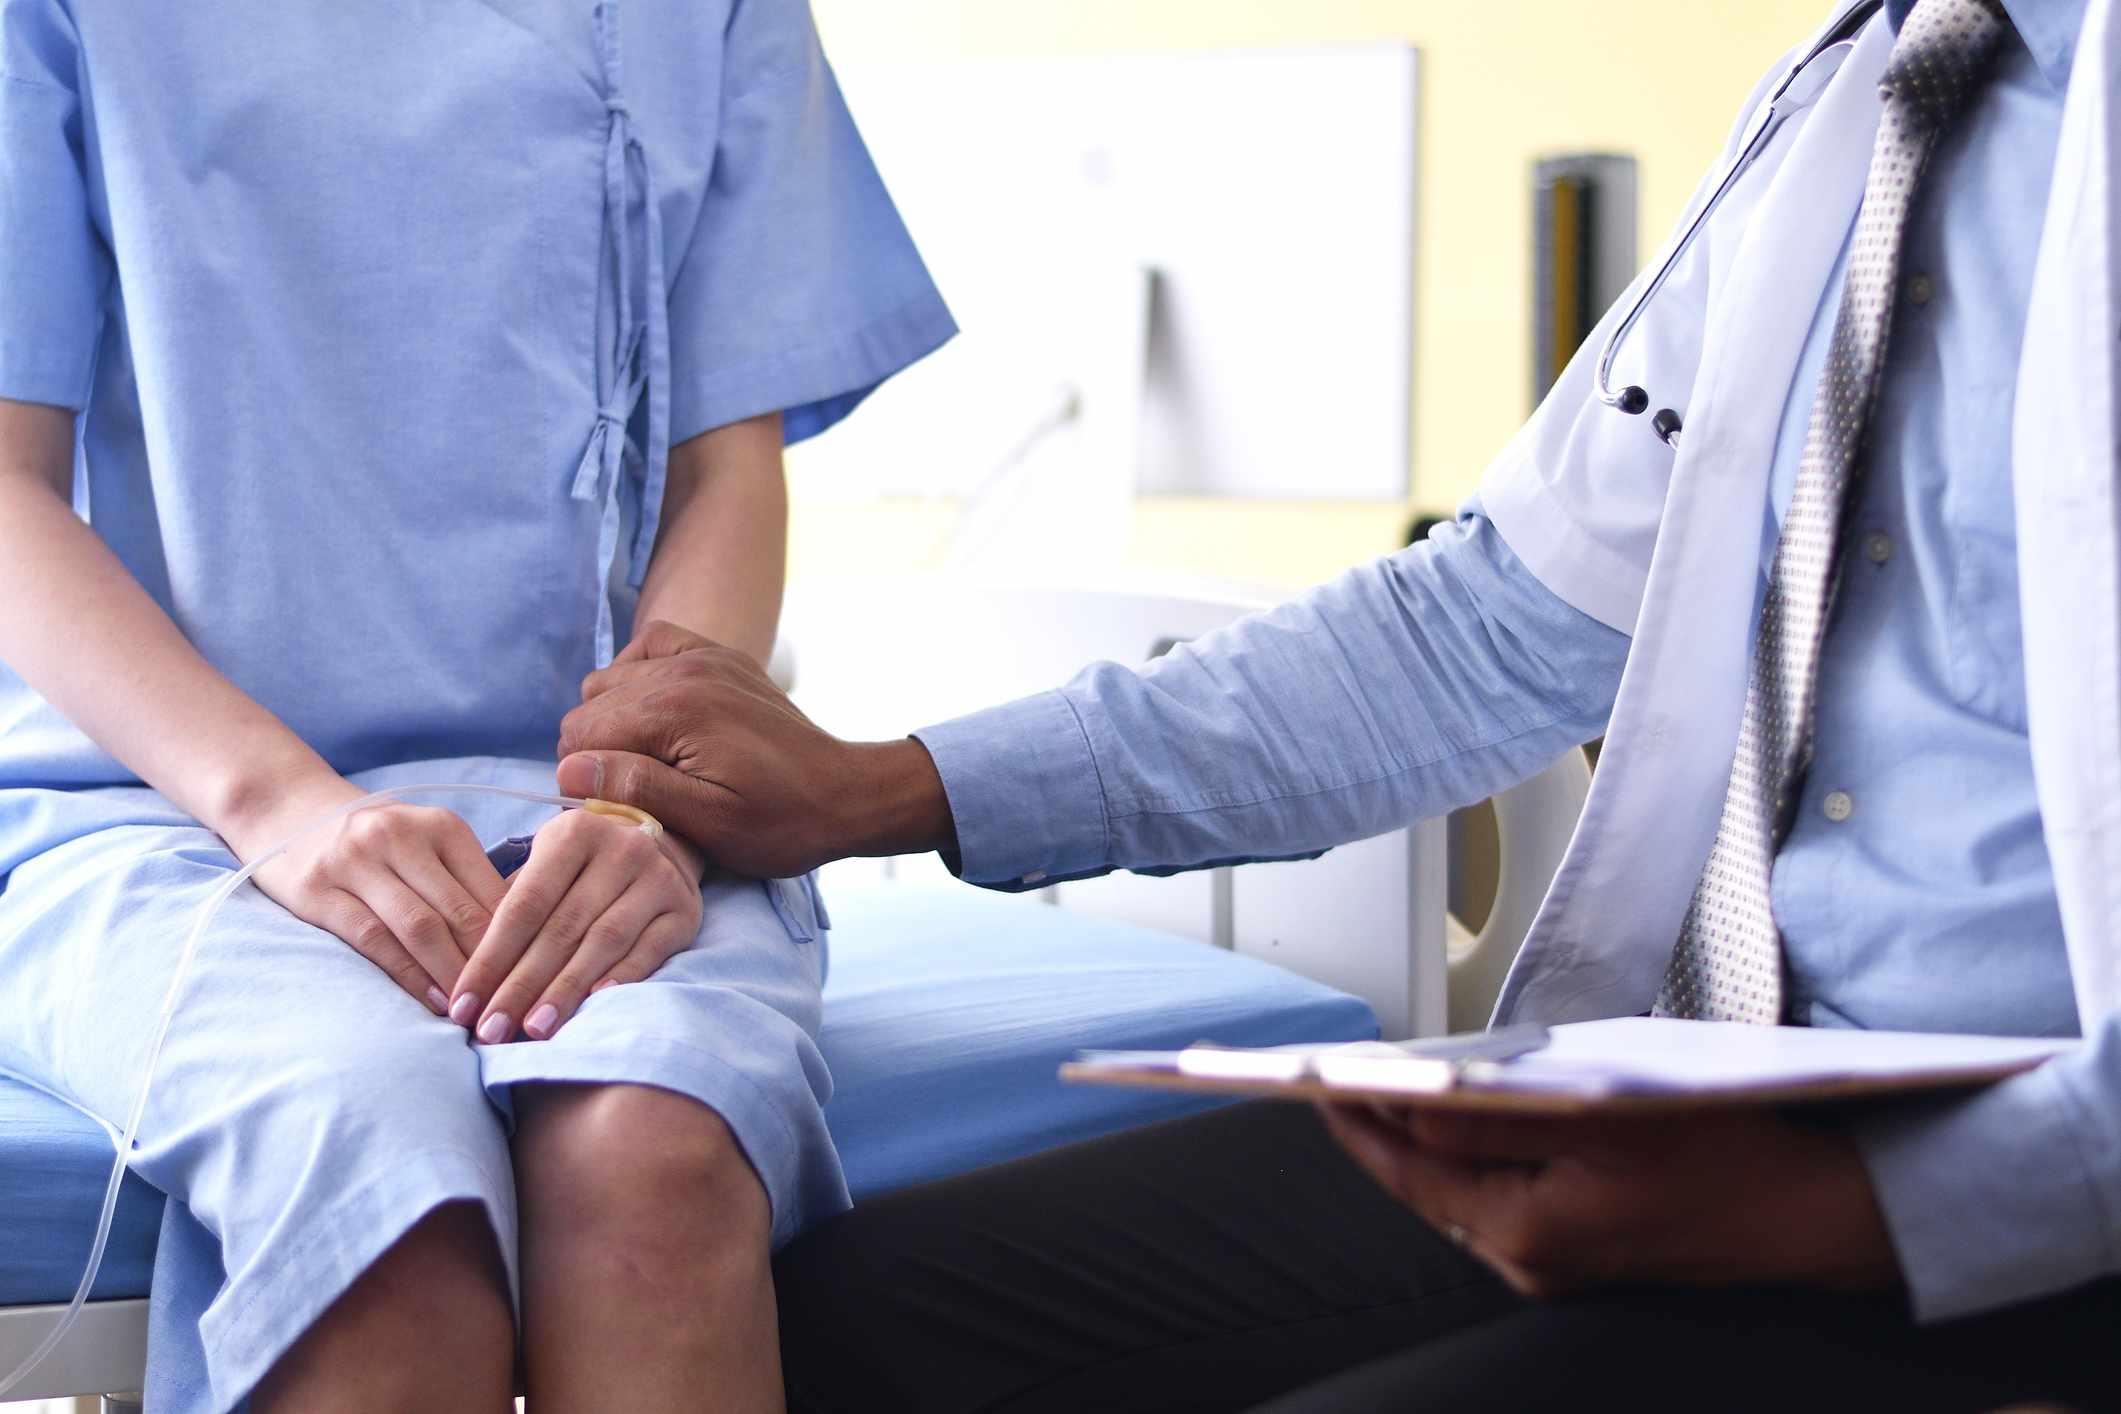 Doctor touching patient's arm in encouragement